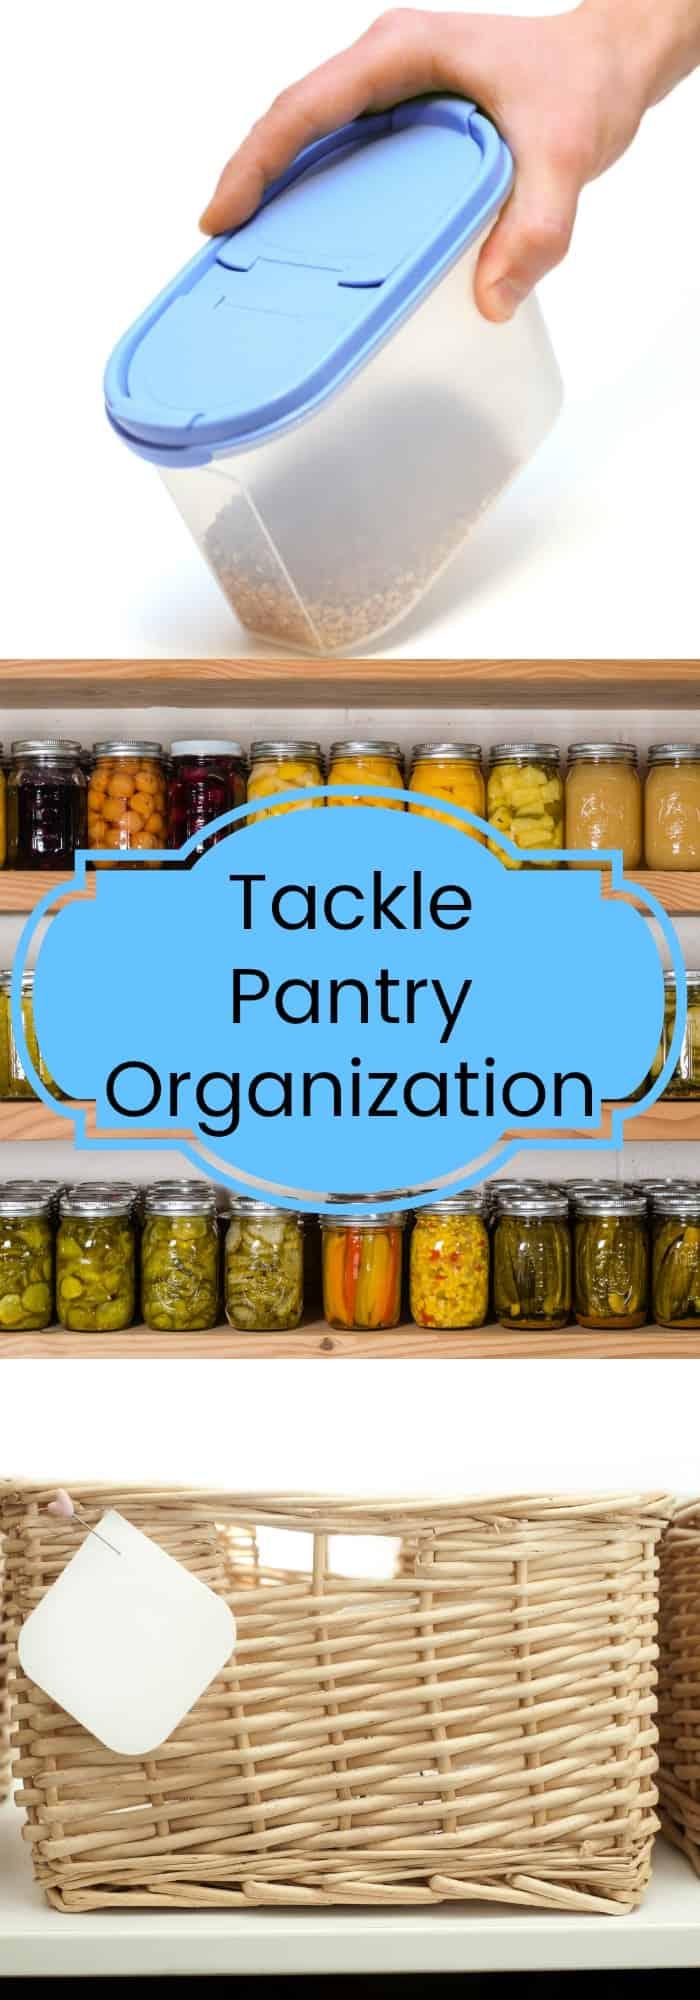 Tackle Pantry Organization